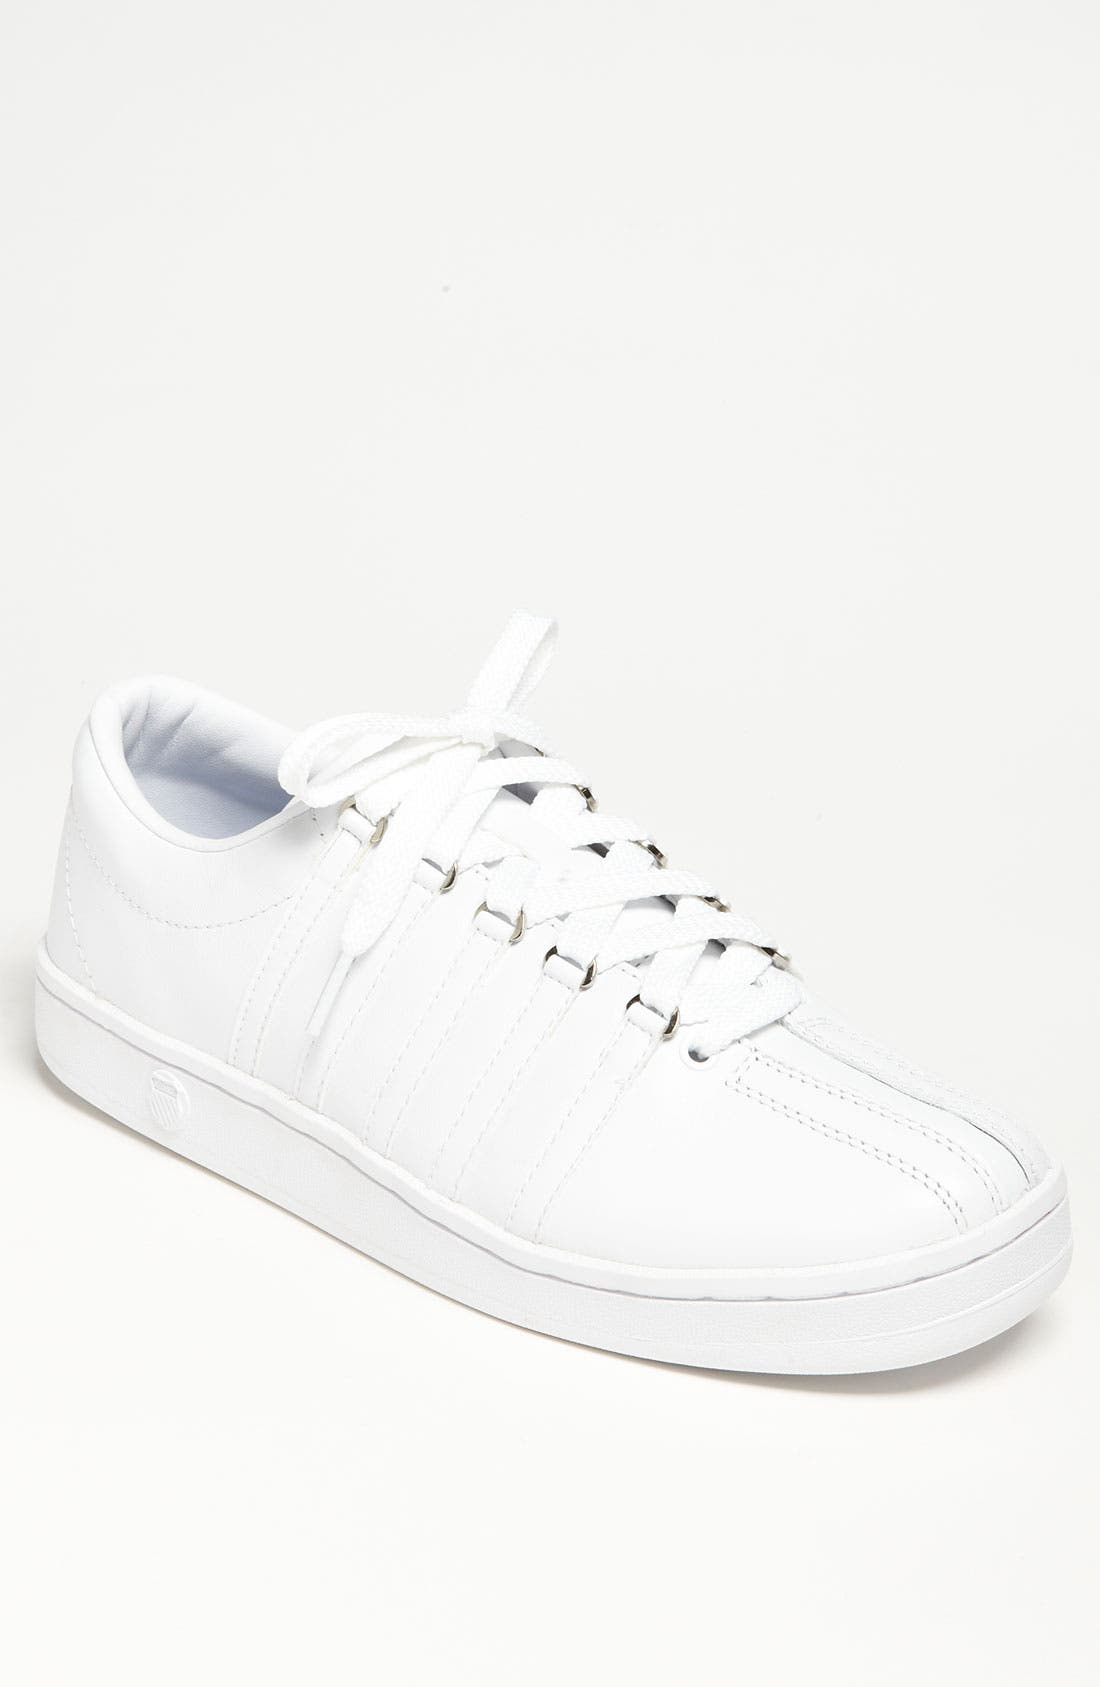 Alternate Image 1 Selected - K-Swiss 'The Classic' Sneaker